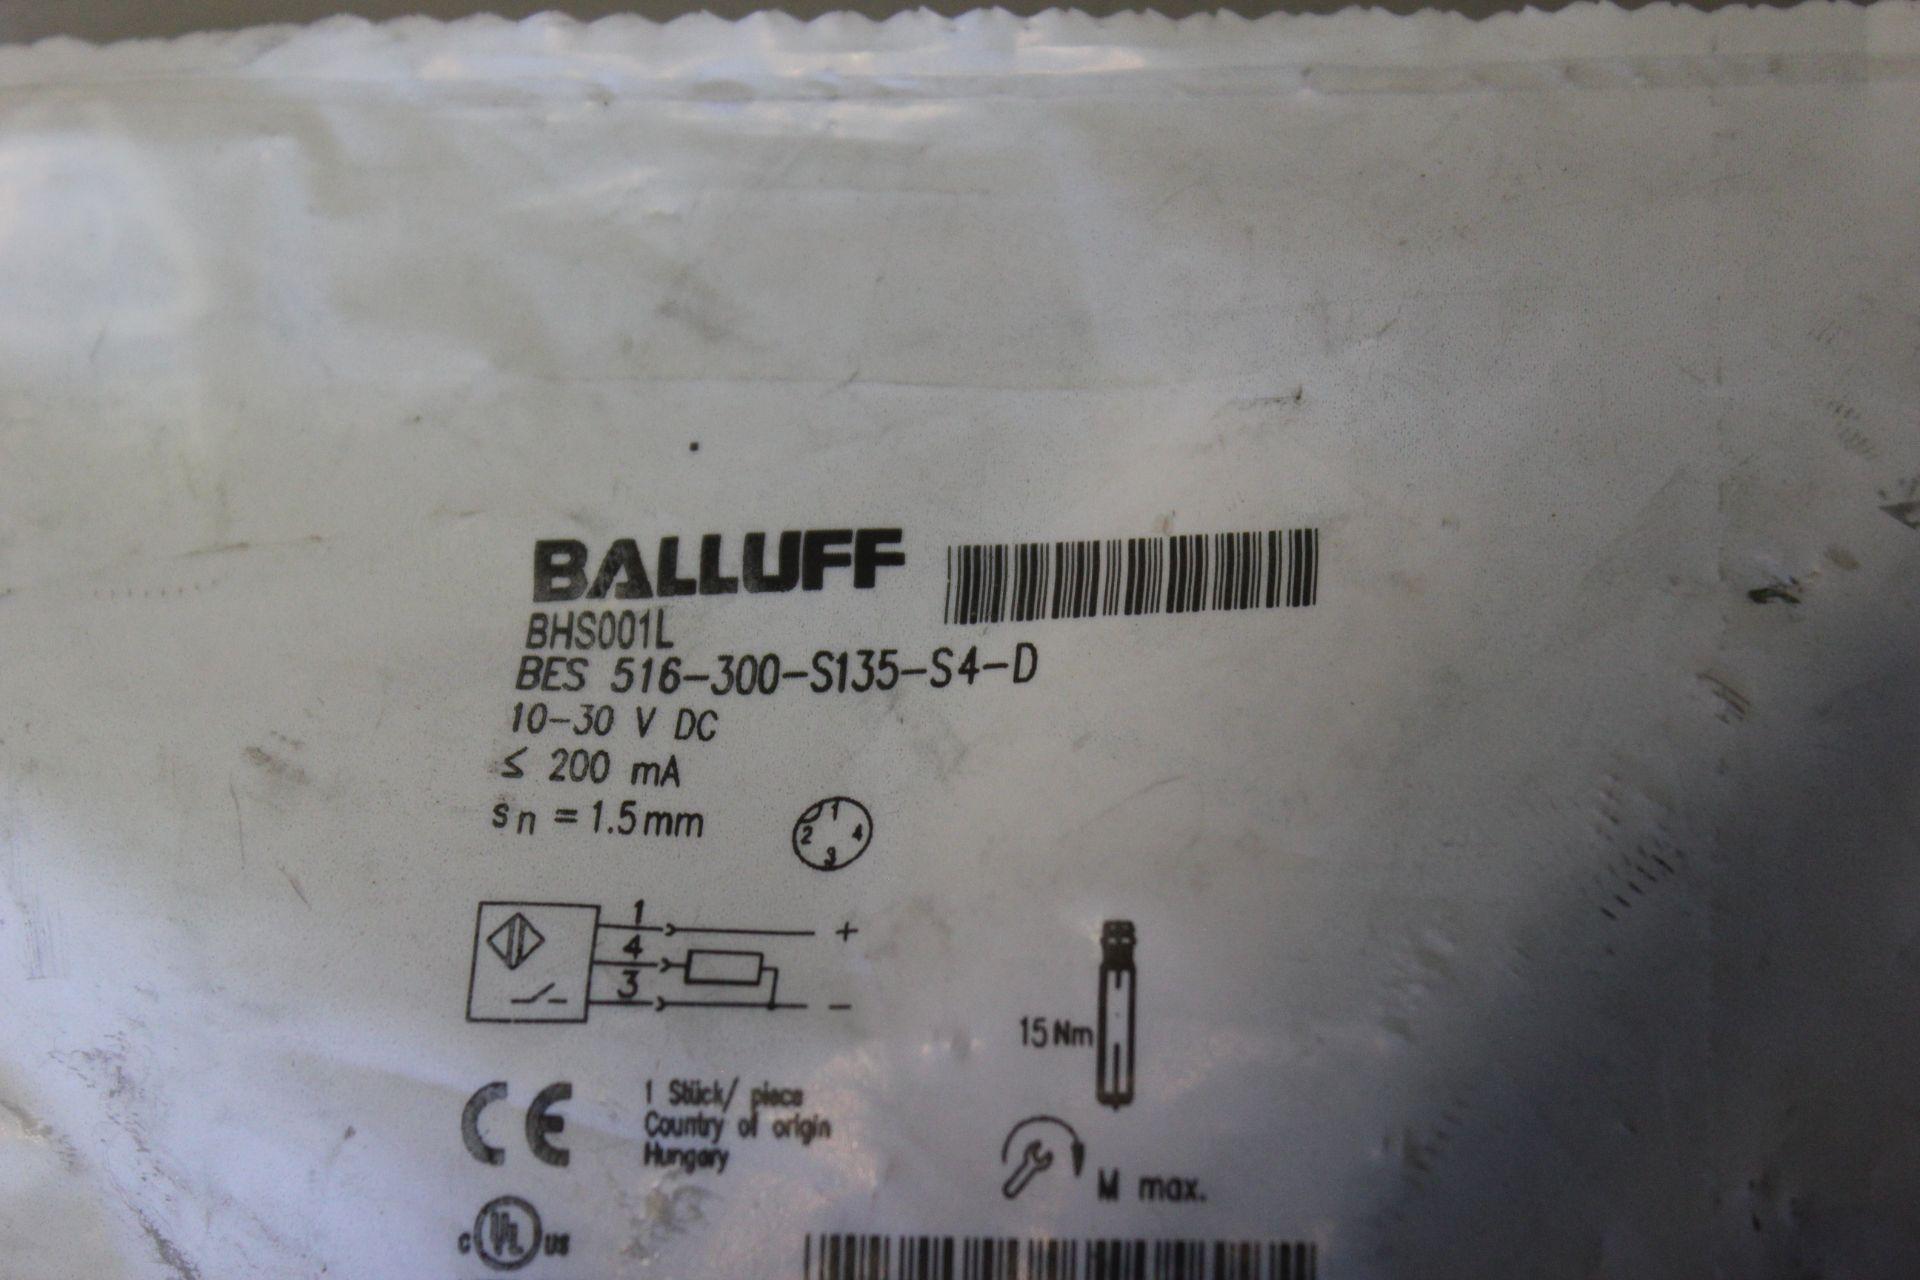 NEW BALLUFF PROXIMITY SENSOR - Image 2 of 3